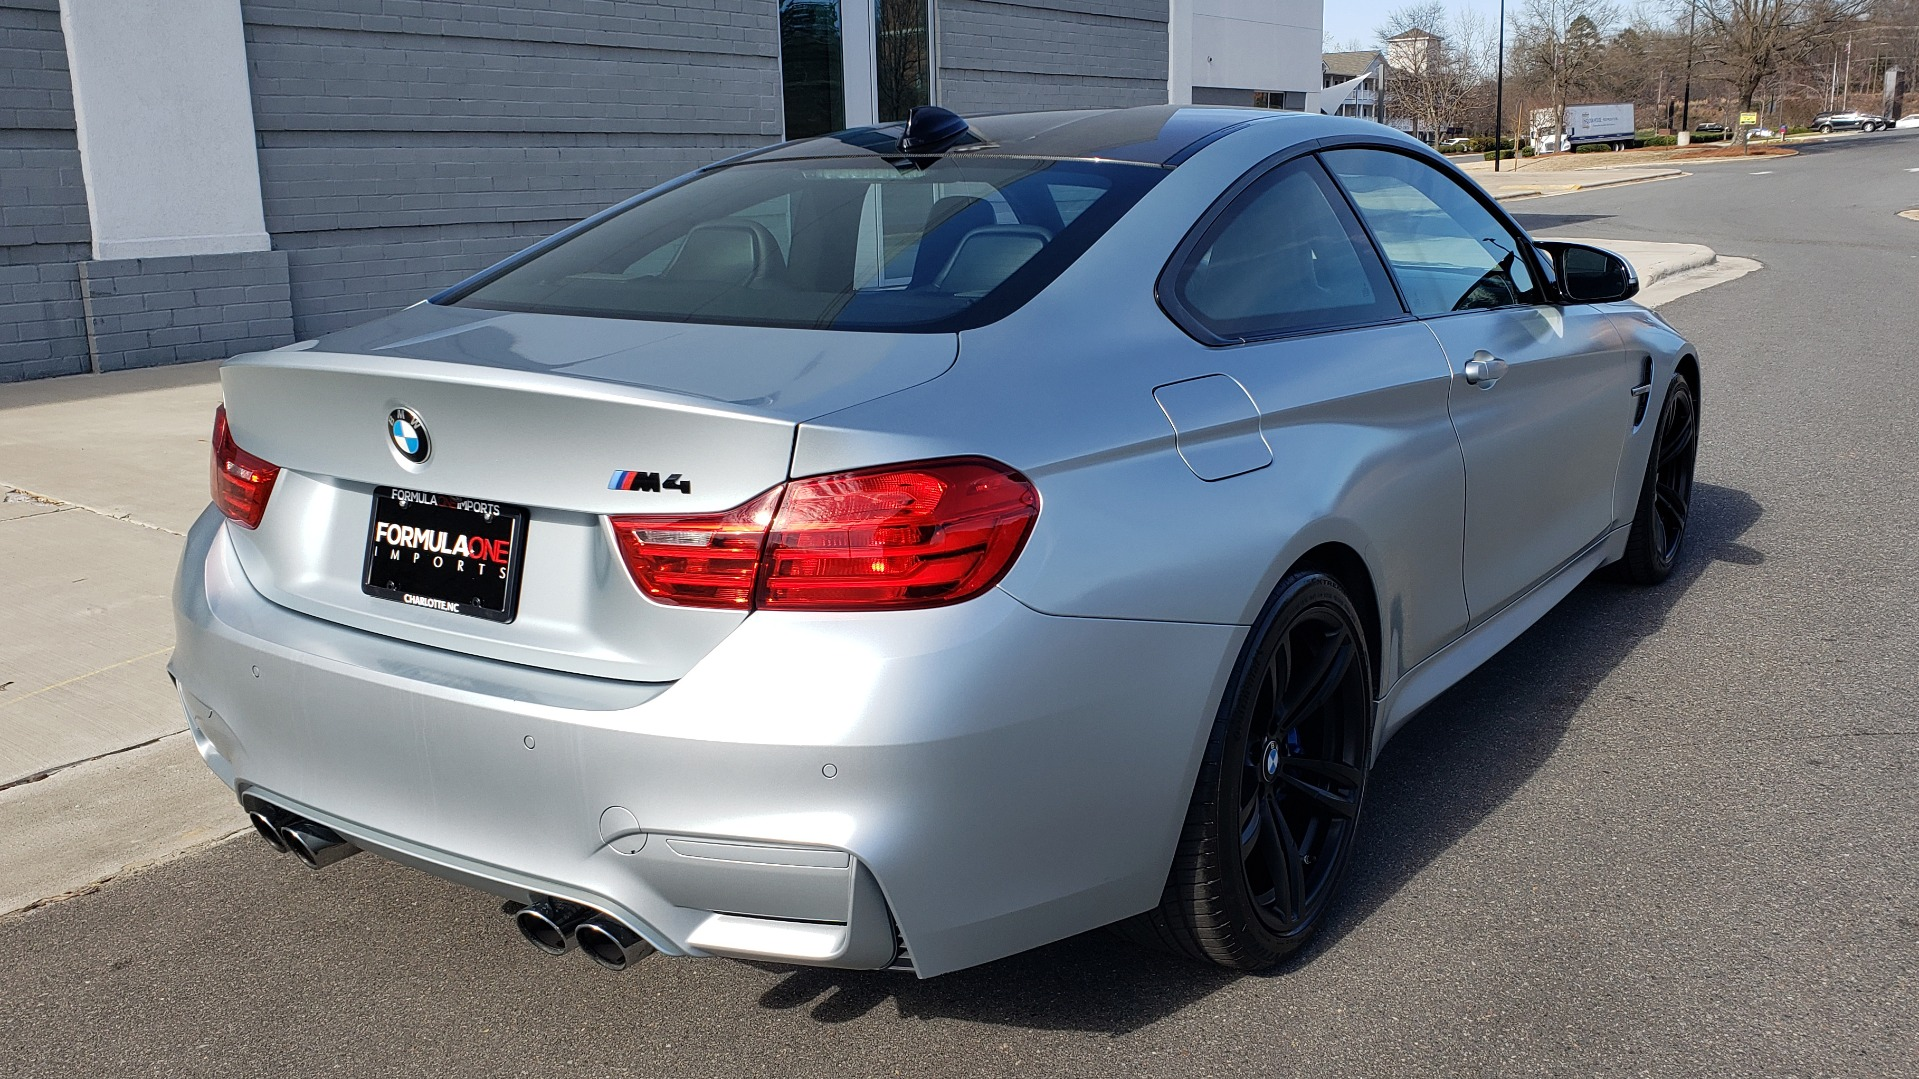 Used 2015 BMW M4 COUPE / EXEC PKG / DRVR ASST PLUS / LIGHTING / M-SUSPENSION for sale Sold at Formula Imports in Charlotte NC 28227 9